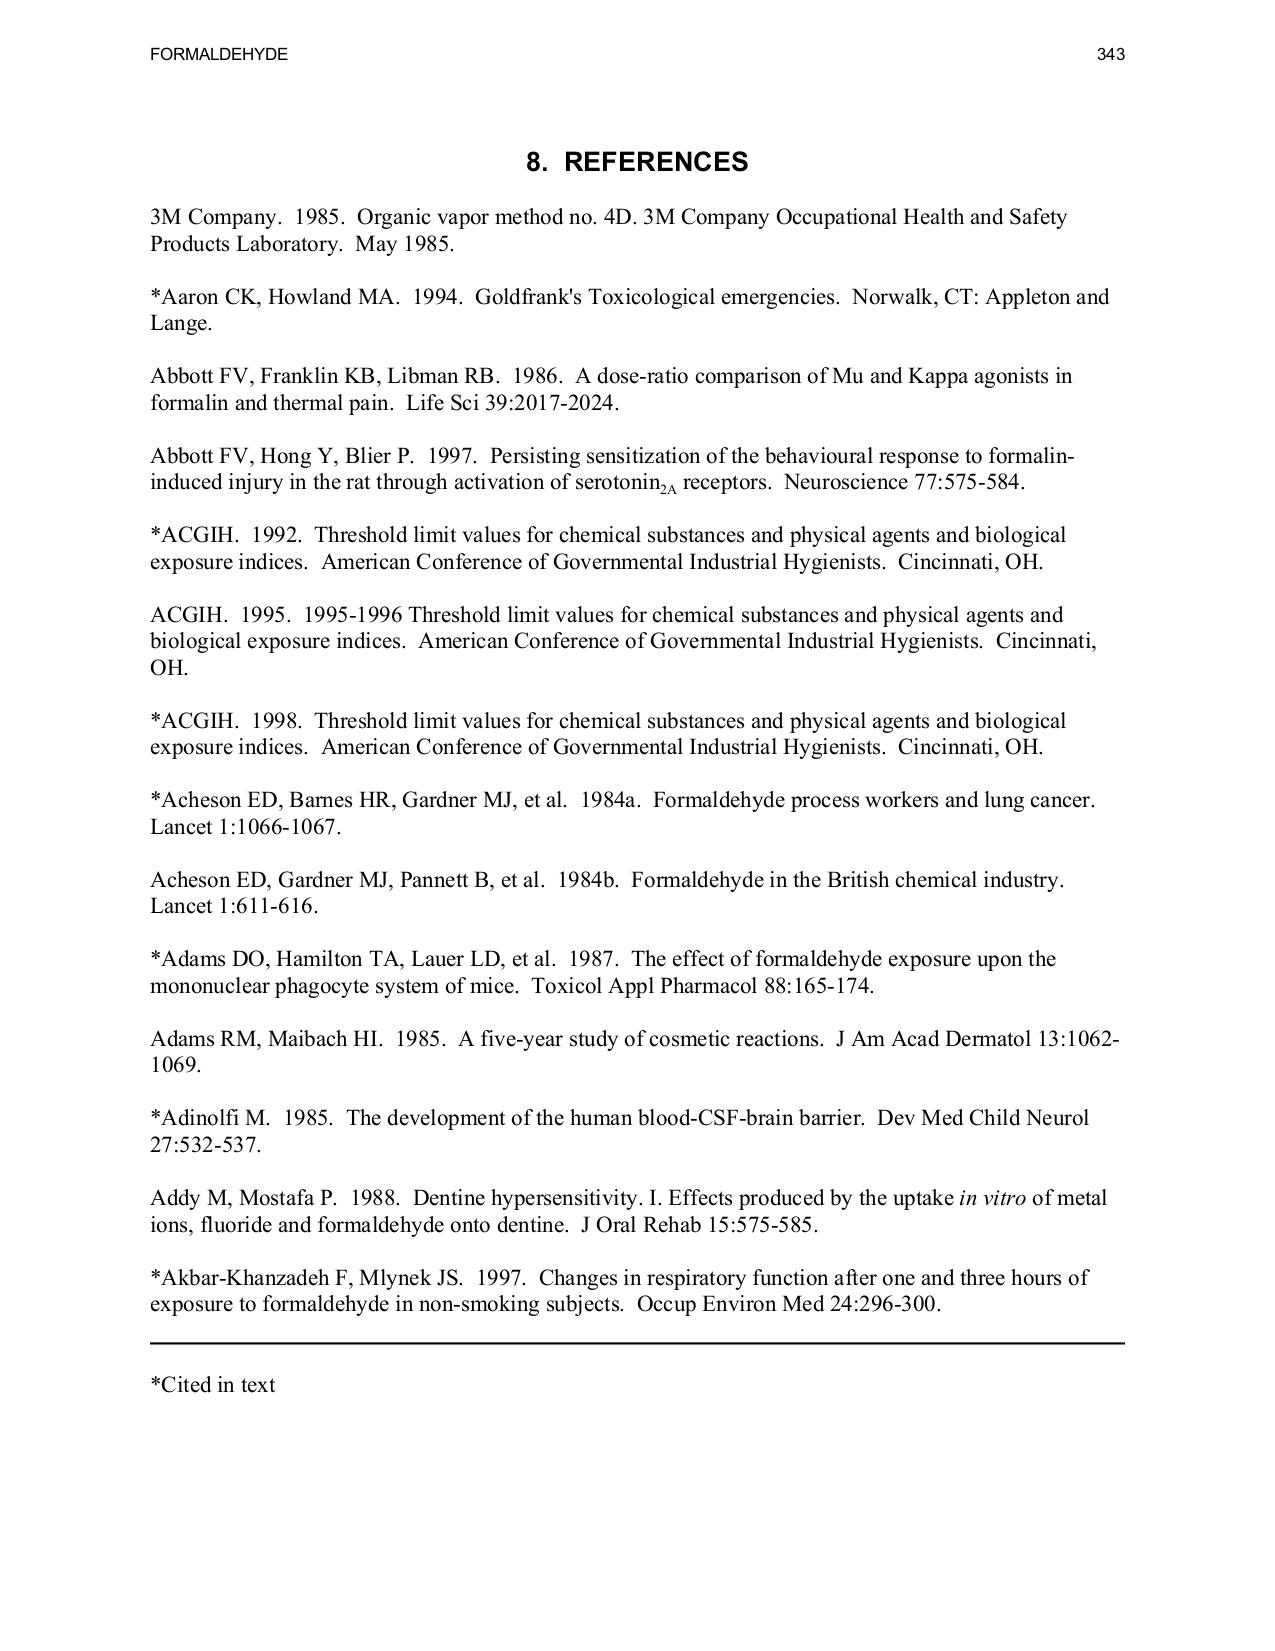 pdf for Luminox Watch 1138 manual